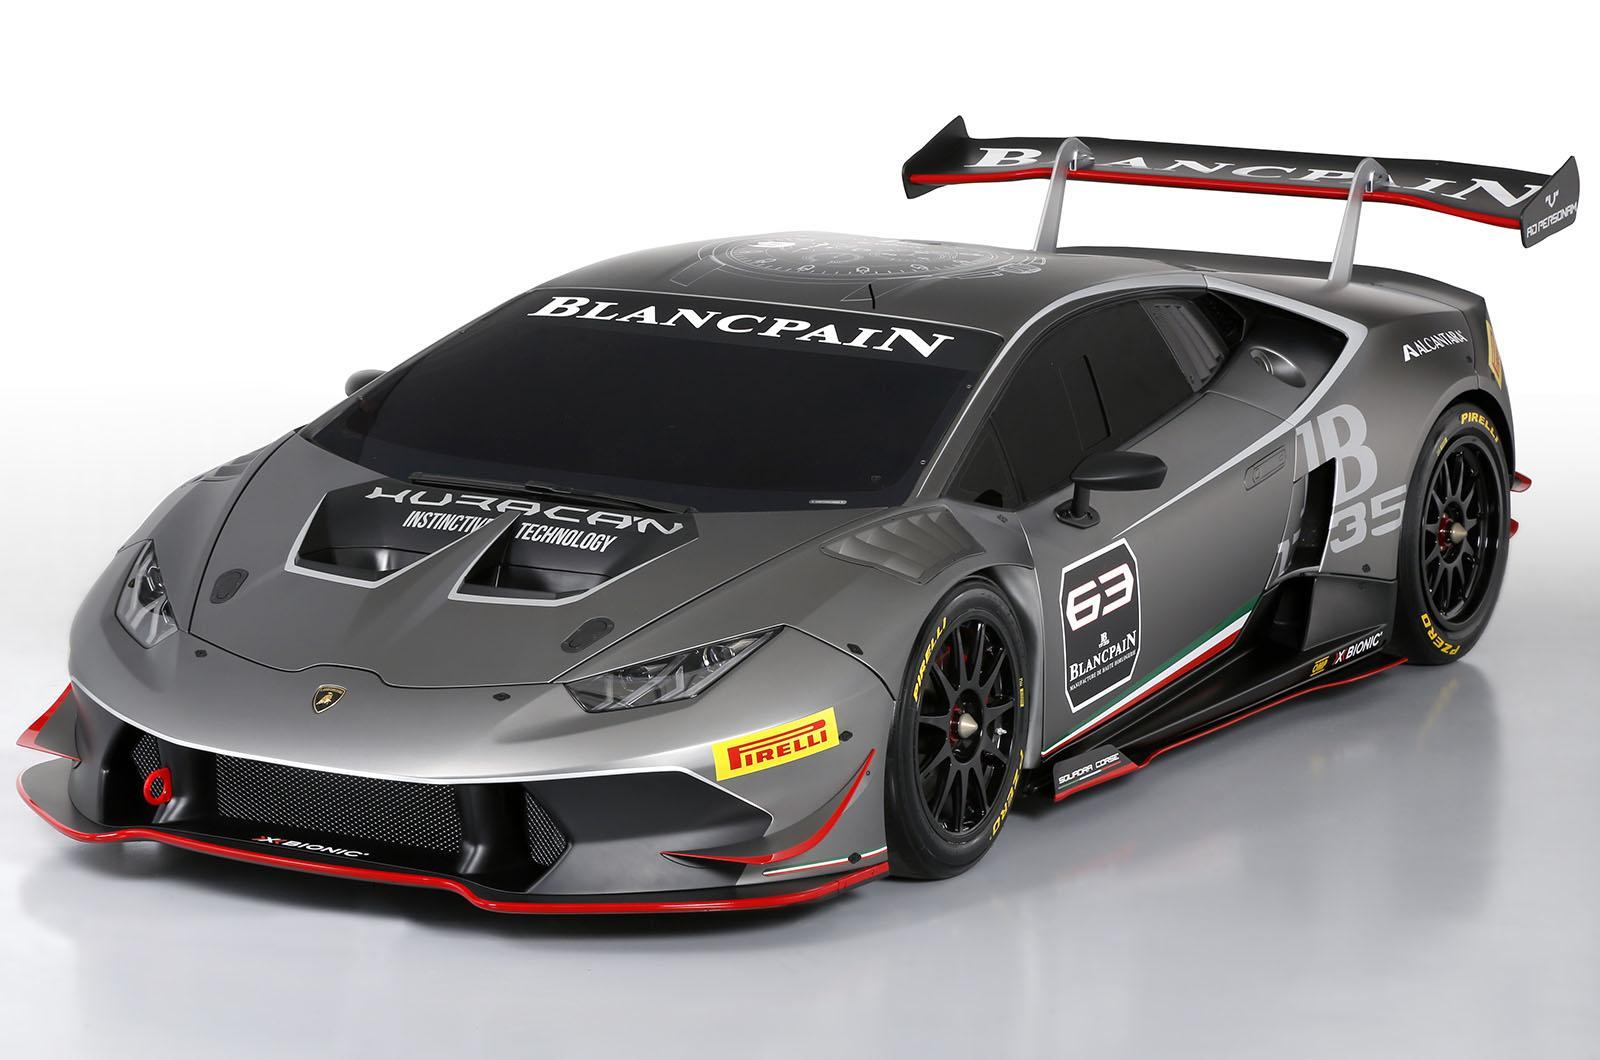 Lamborghini Reveals 2015 Super Trofeo Calendar, Confirms United SportsCar Championship Plans